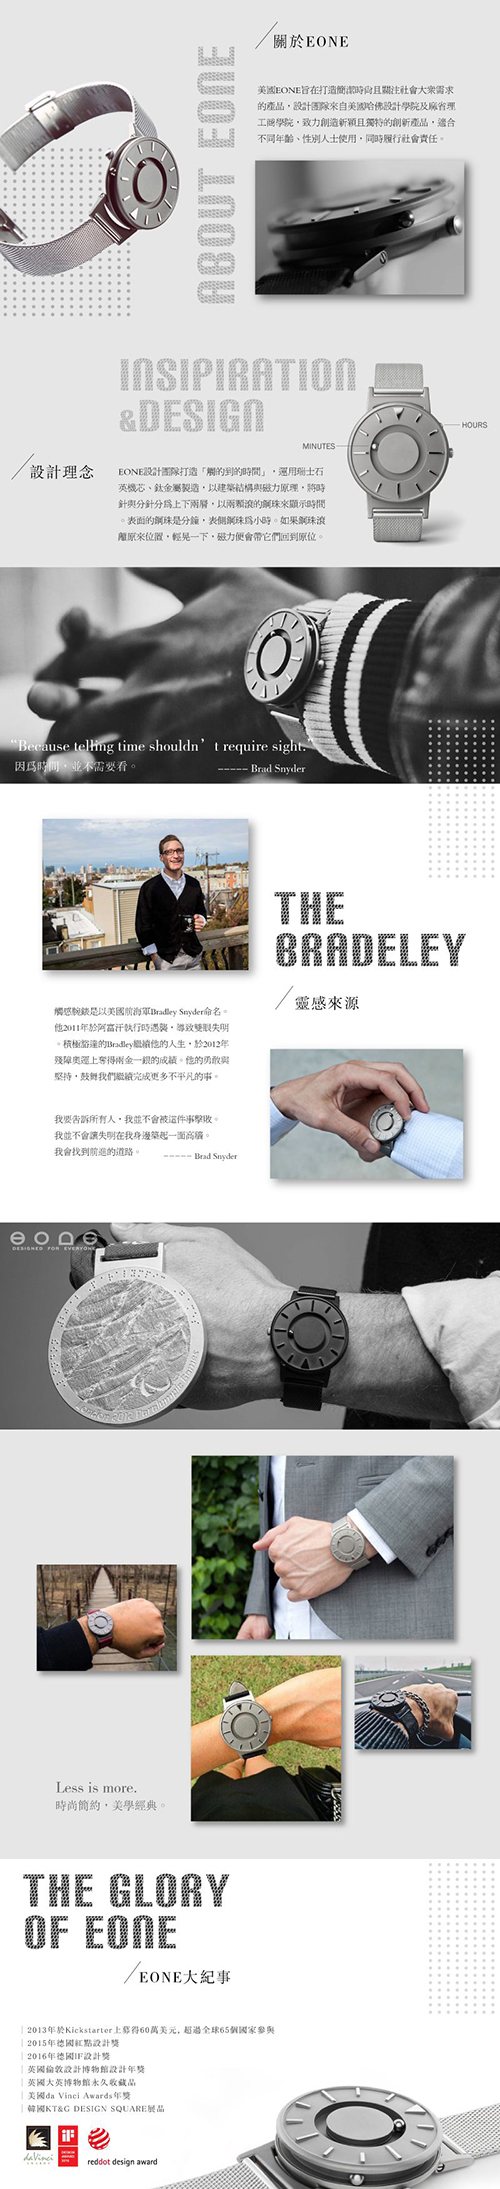 EONE|The Bradley 觸感腕錶(行星黑)